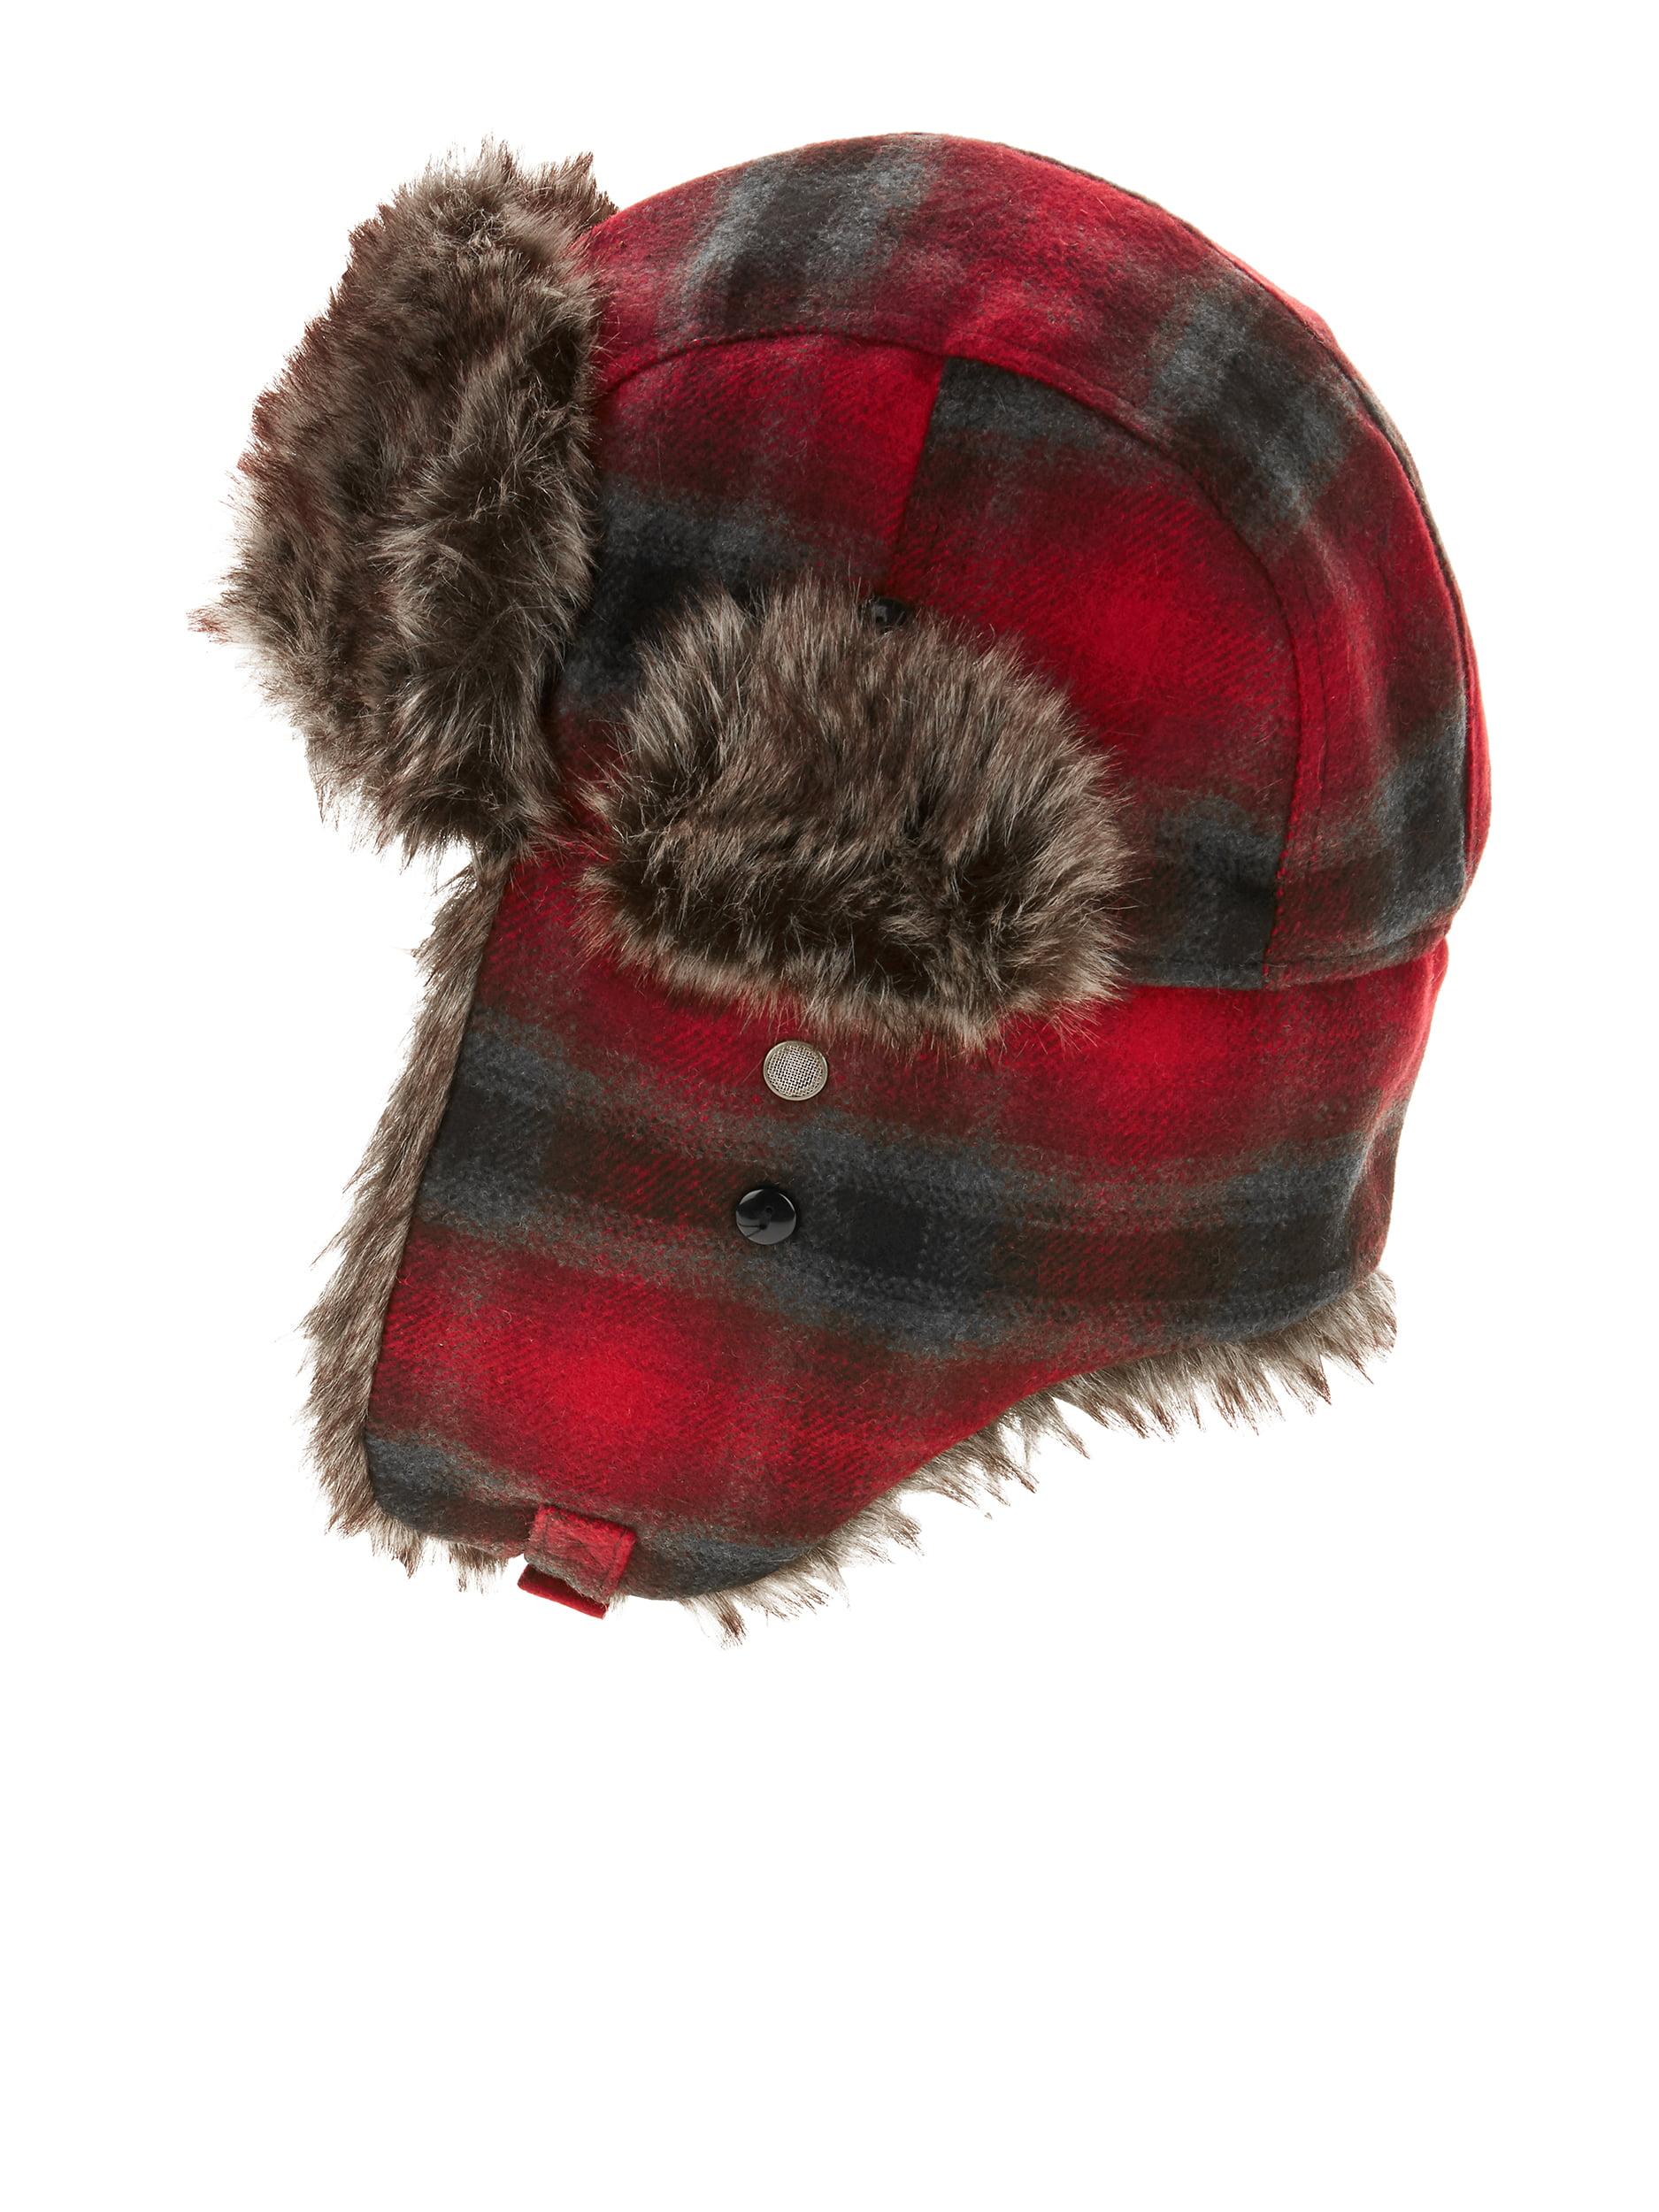 64a66acebc1b8 Swiss+Tech - Men s Swiss Tech Trapper Hat with Faux Fur Lining and Chin  Strap - Walmart.com